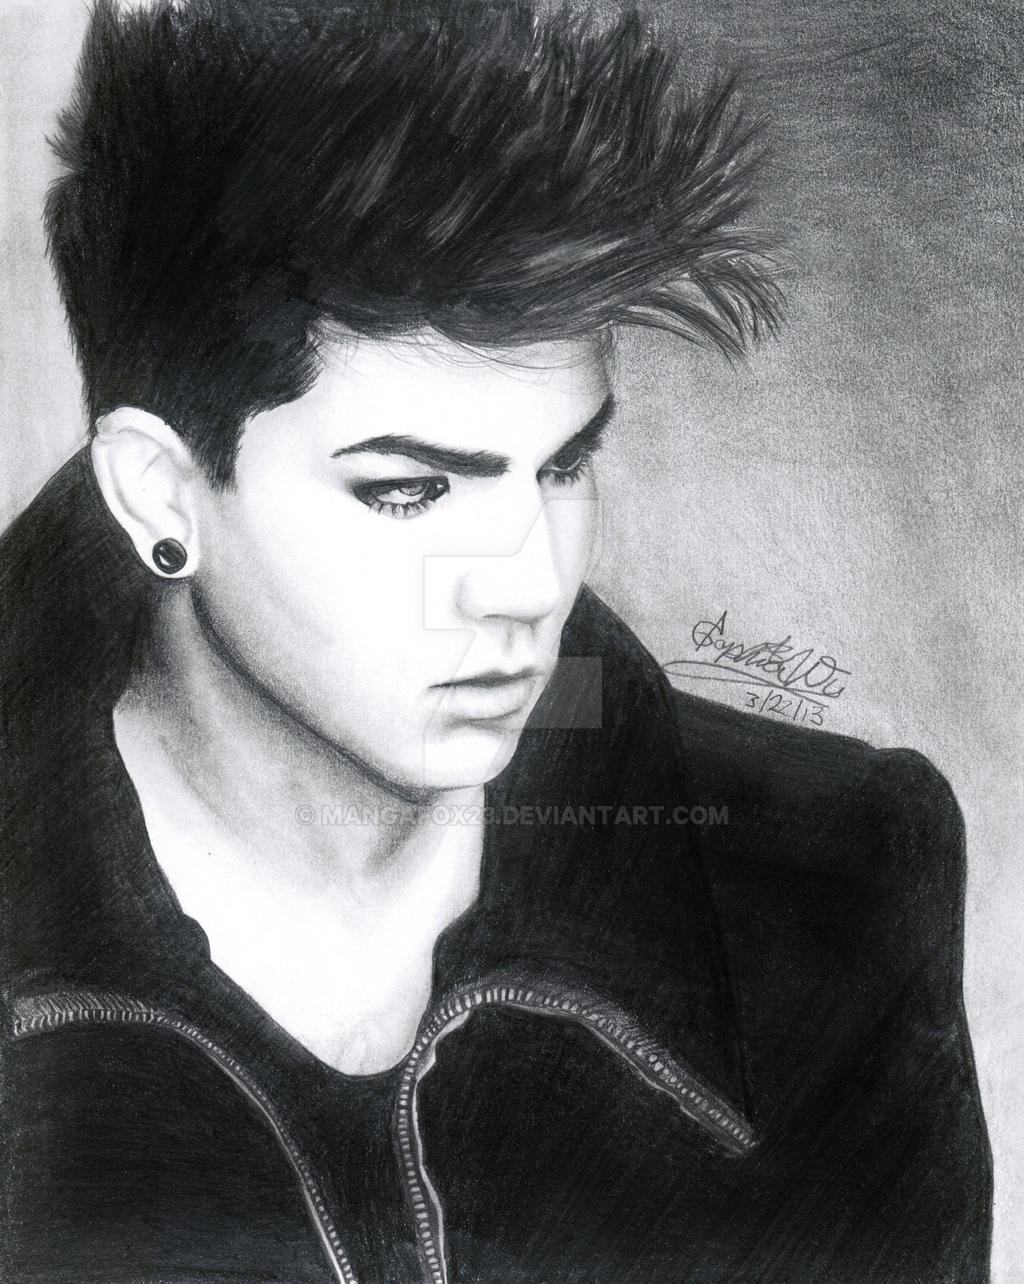 Adam Lambert Trespassing by mangafox23 on DeviantArt